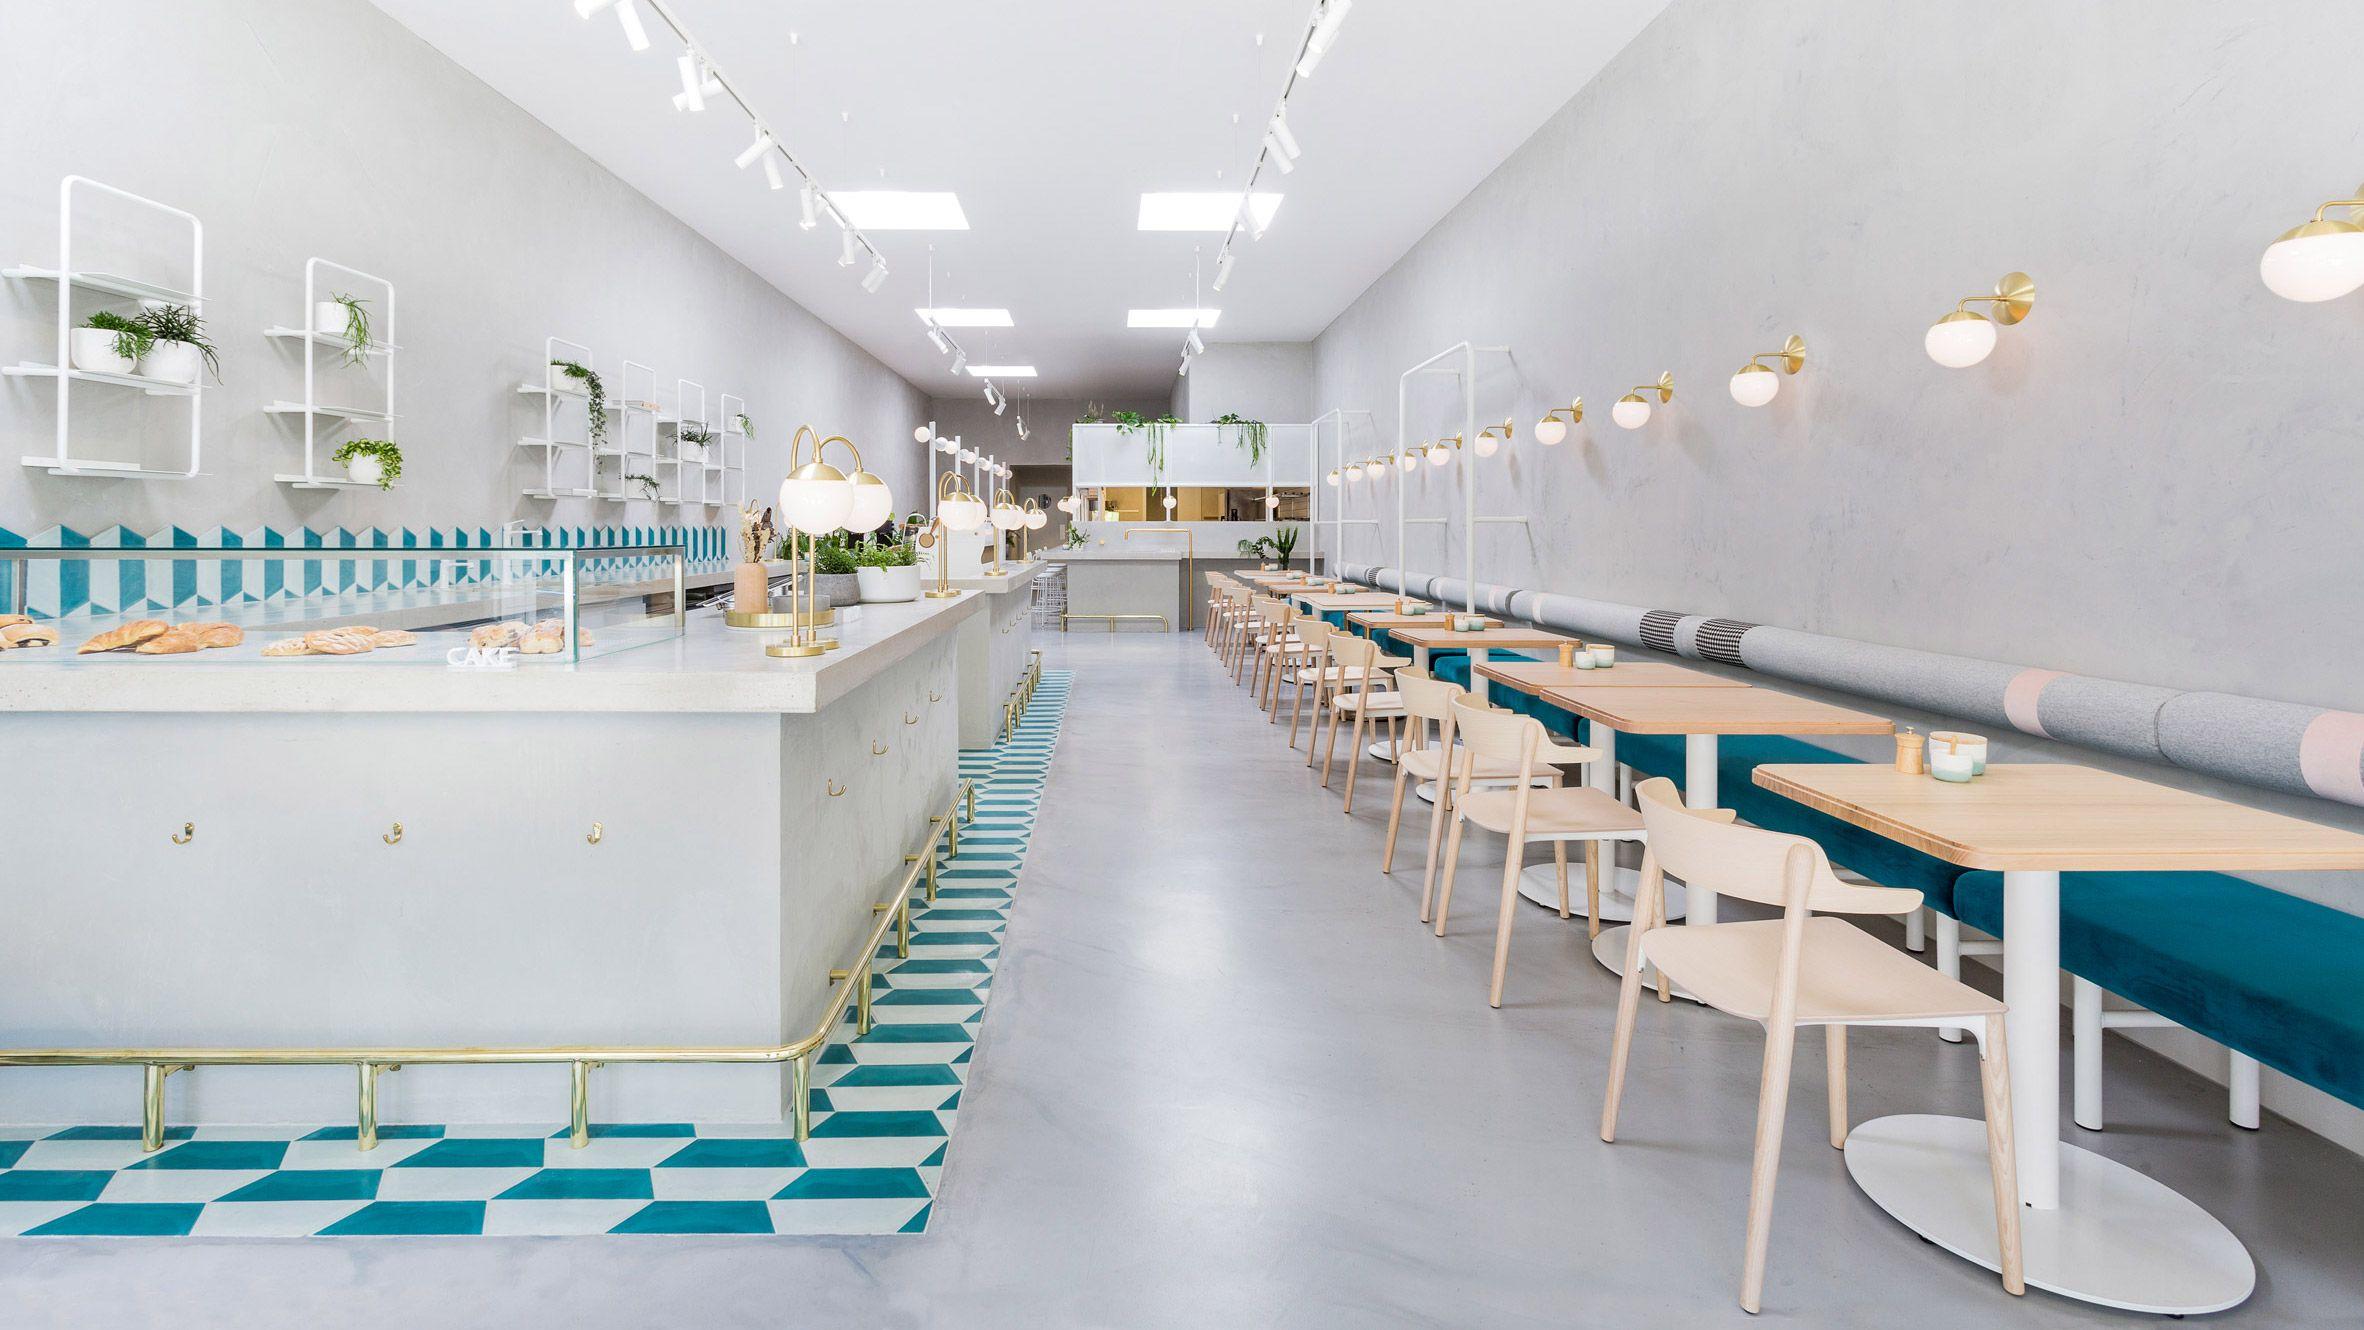 Biasol Creates Melbourne Cafe Interior Based On 1950s Greek Delicatessens Cafe Interior Design Restaurant Design Hospital Interior Design